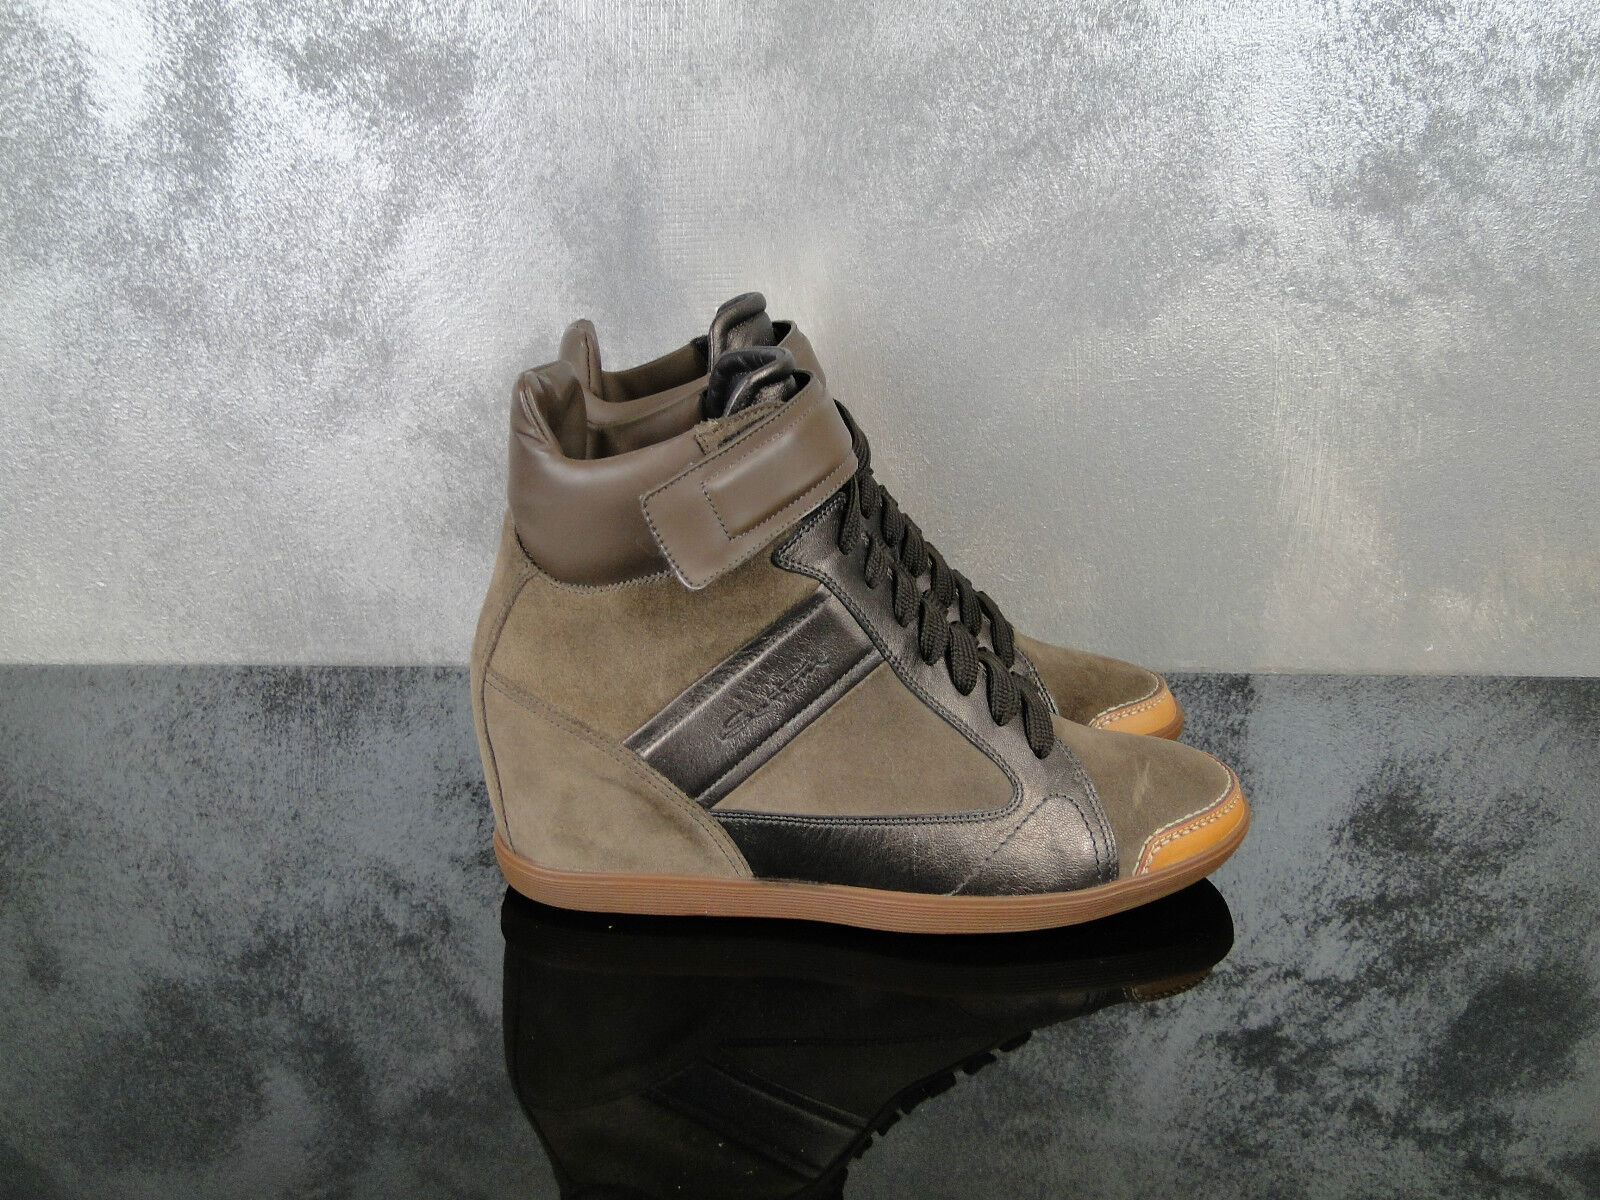 SANTONI zapatos mujer SCARPONCINO   WOMAN zapatos TG 40 1\2